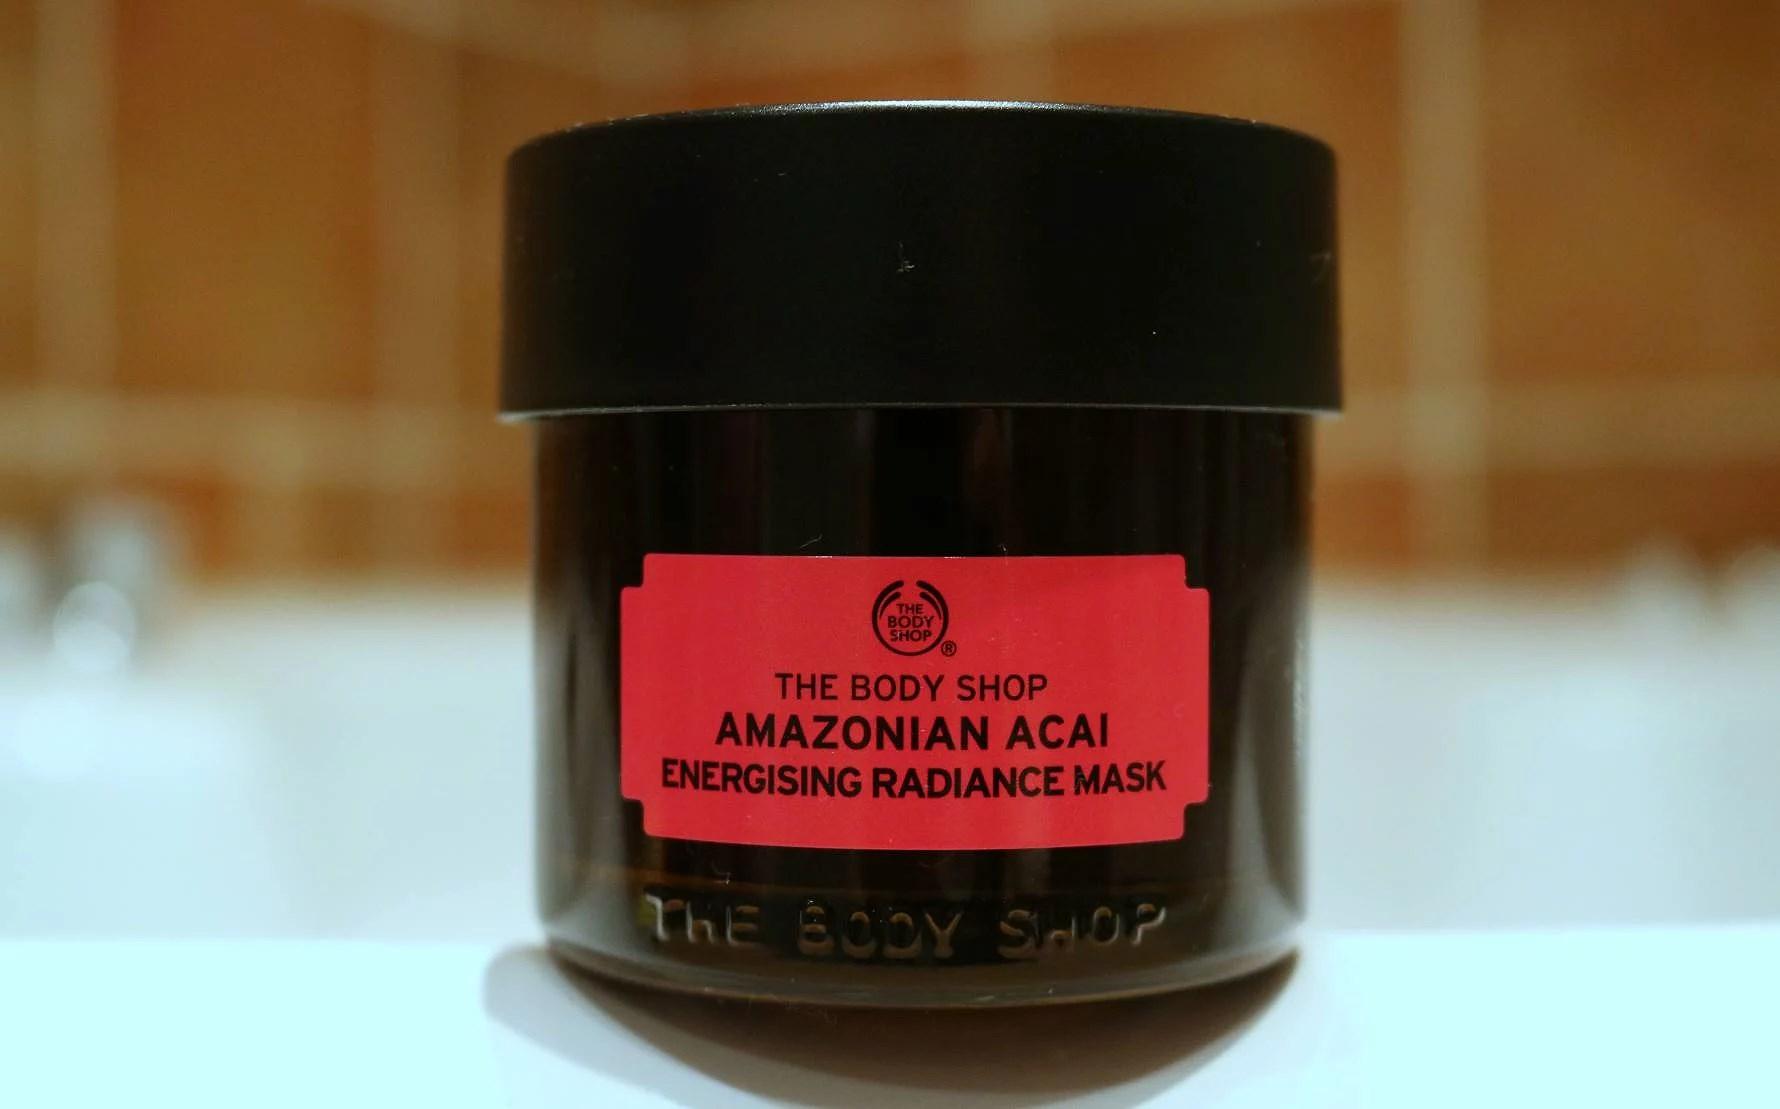 The Body Shop - Amazonian Acai Mask